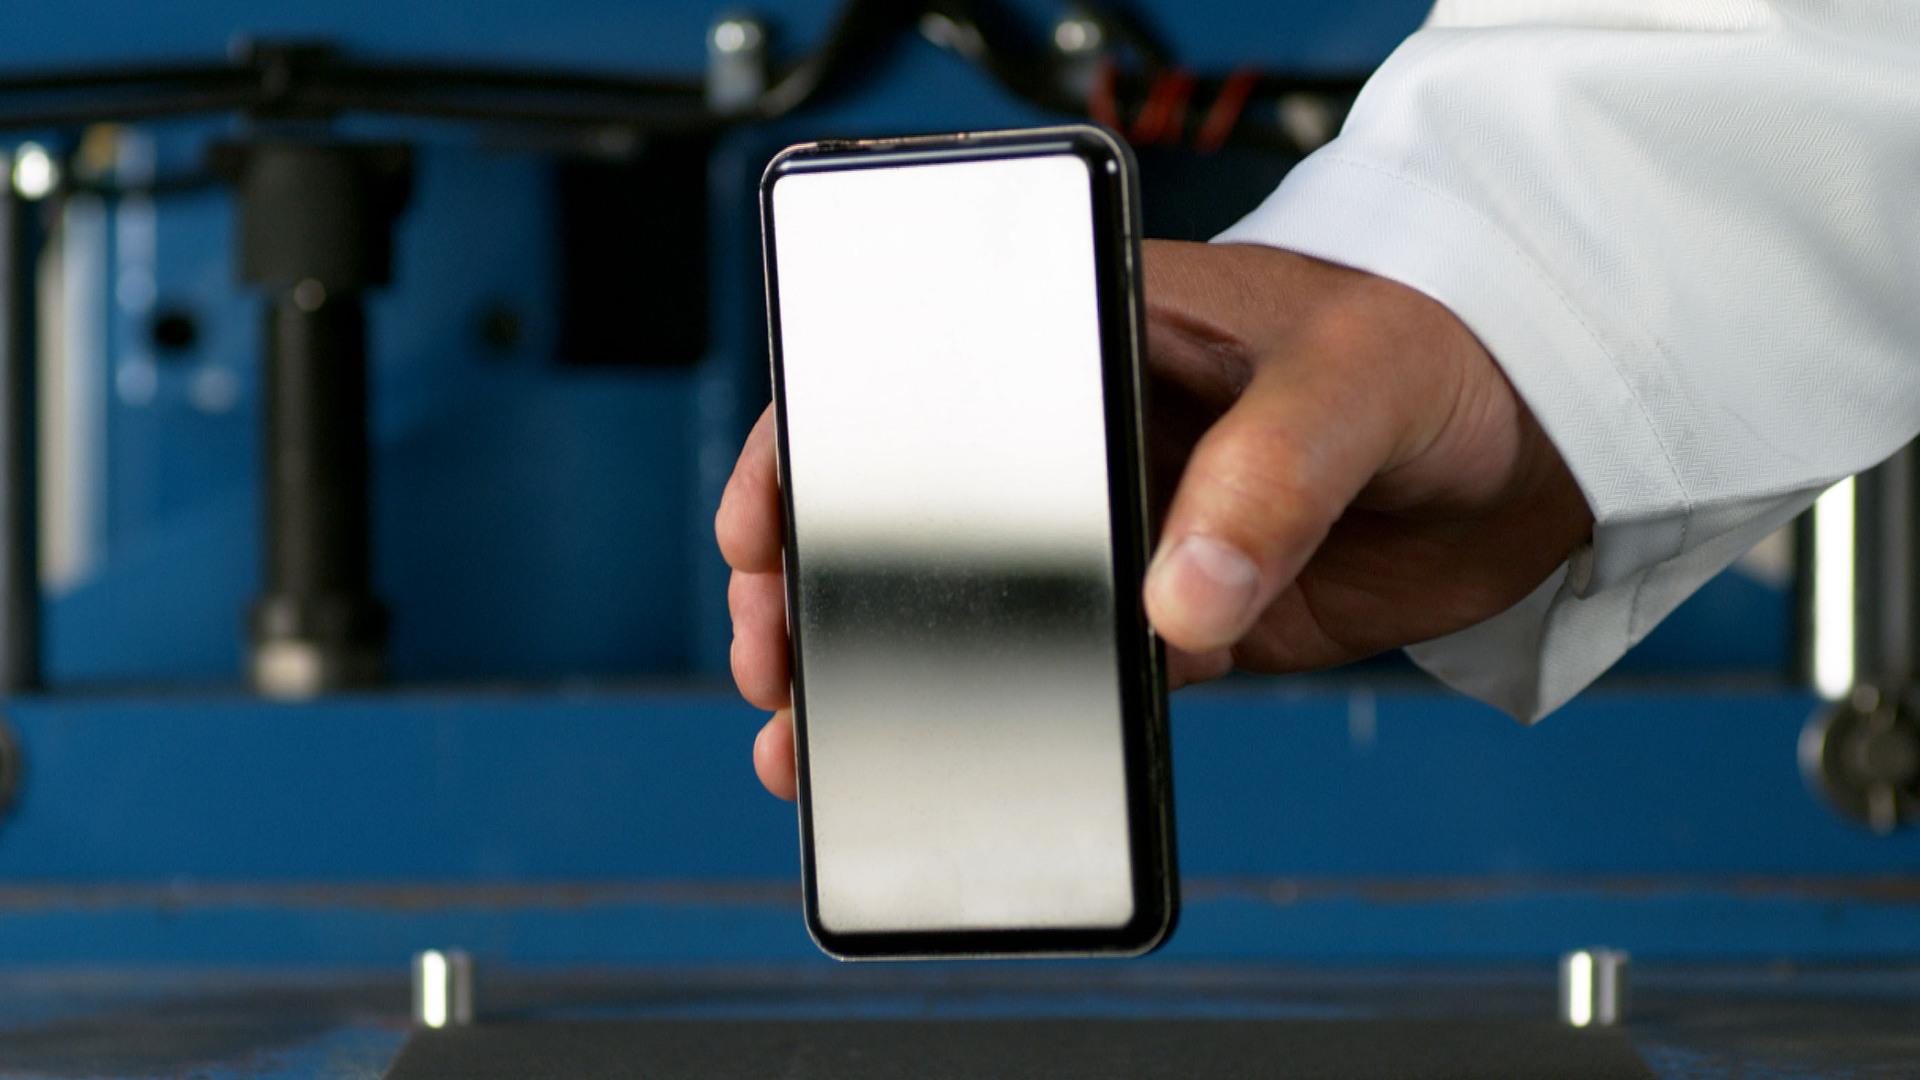 Corning Gorilla Glass Victus display on smartphone puck